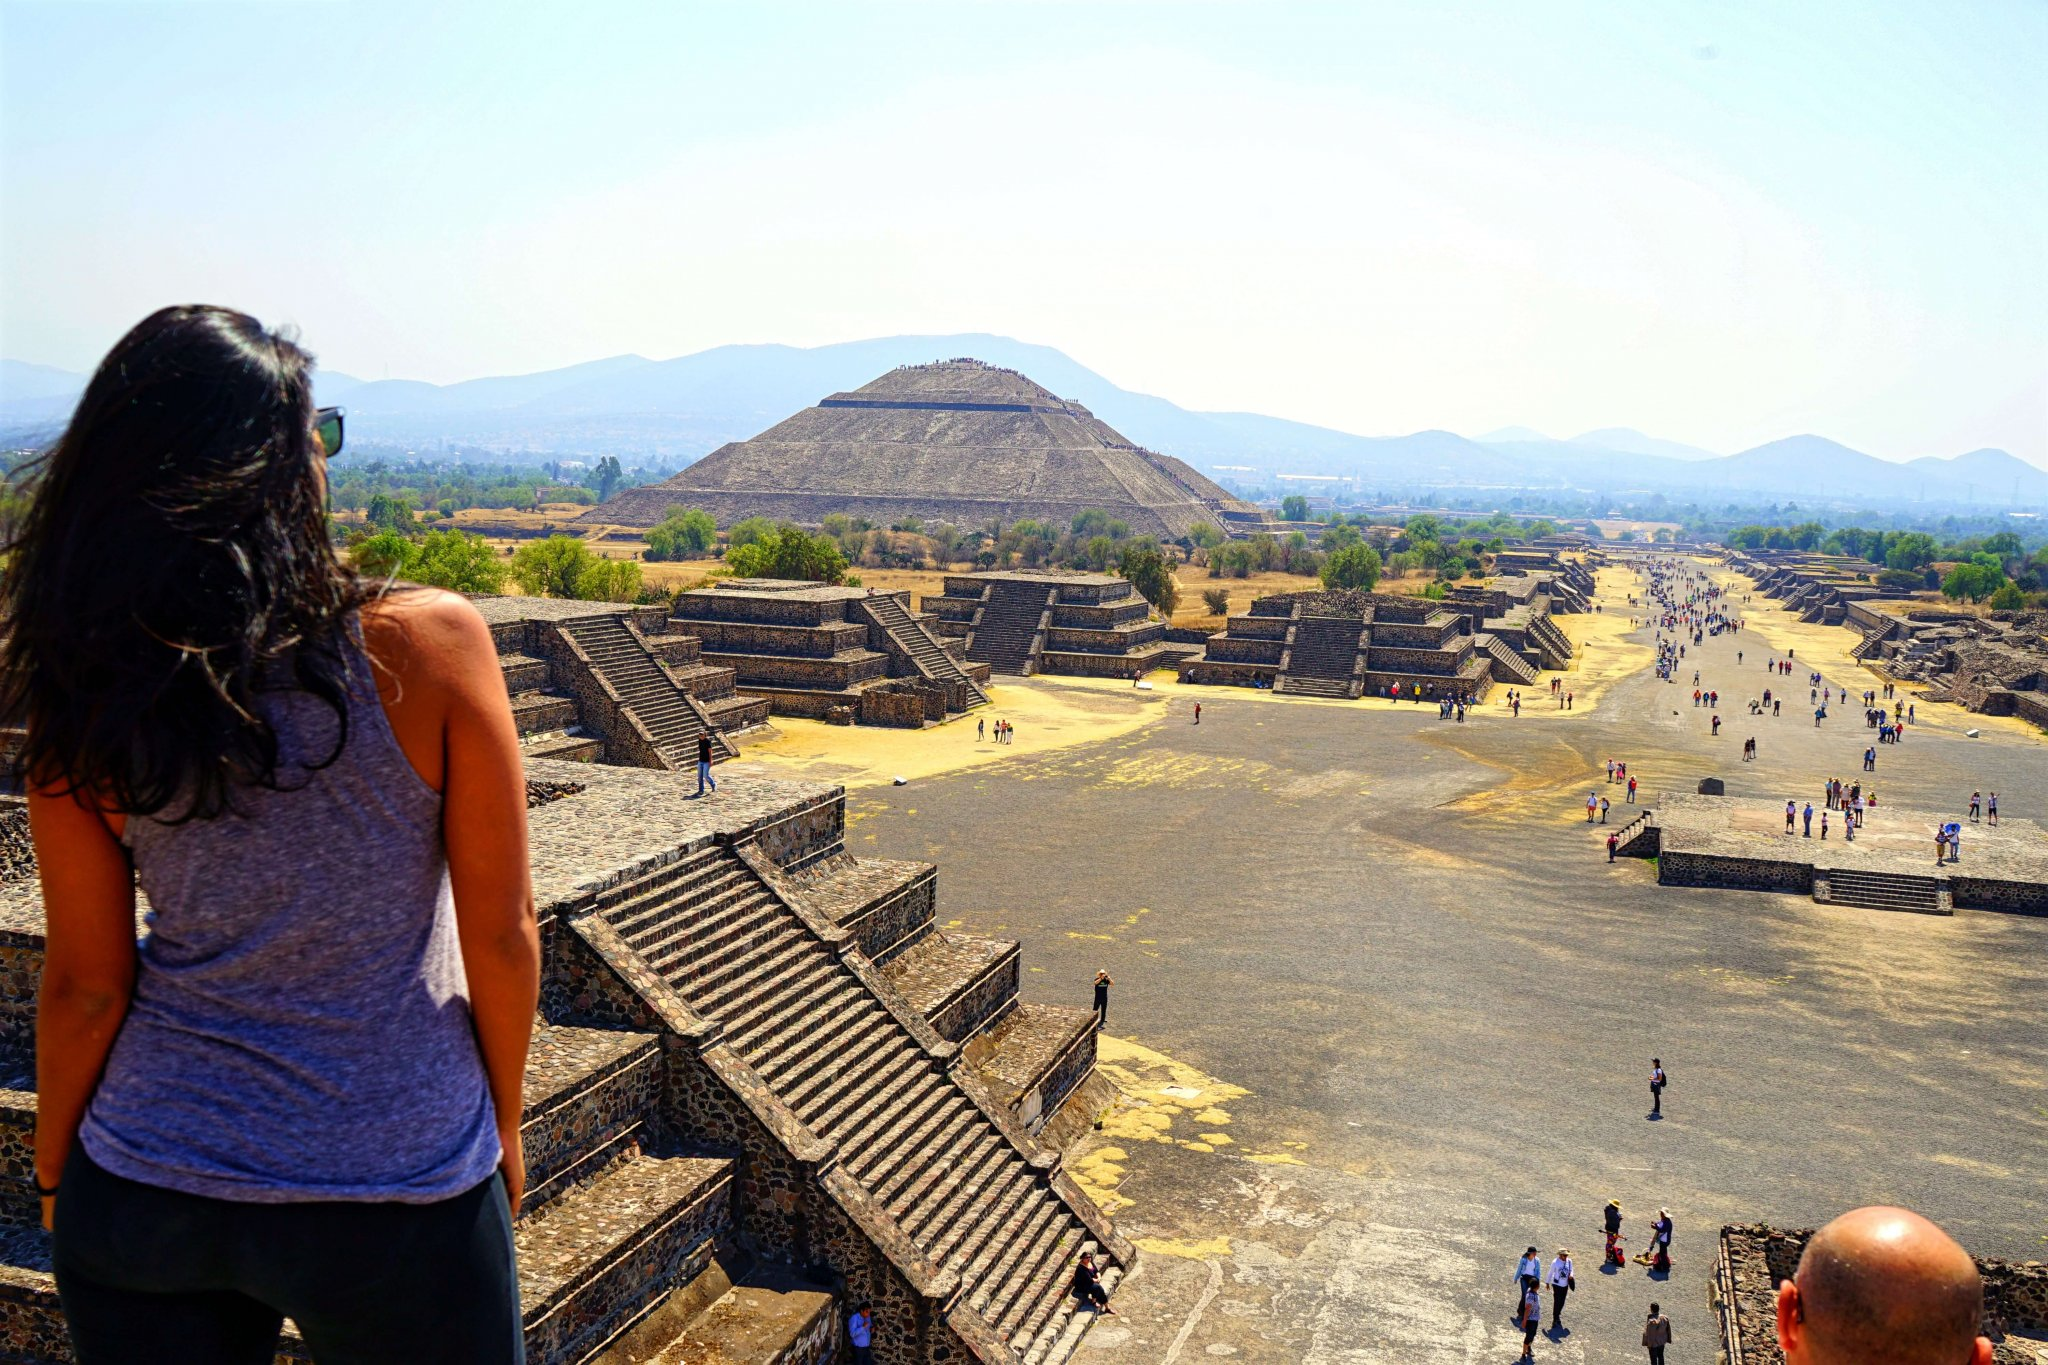 Teotihuacan Pyramids - Pyramid of the Moon